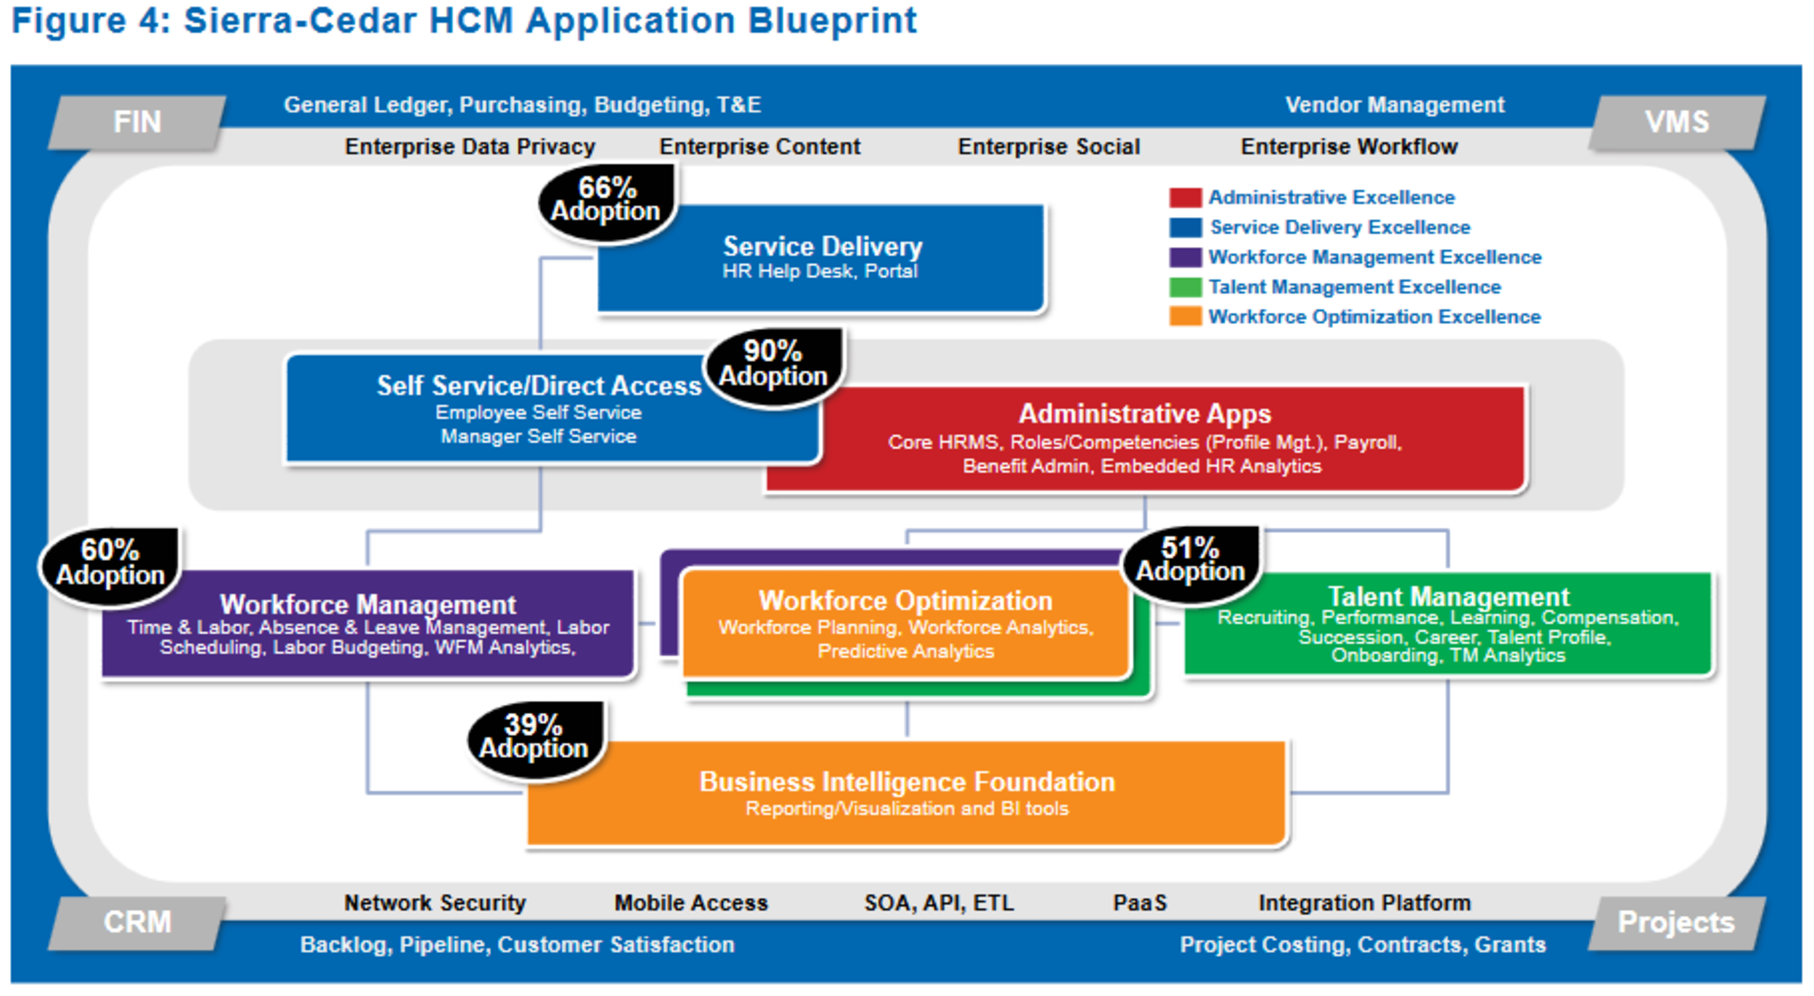 Graphic representation of the Sierra-Cedar HCM Application Blueprint